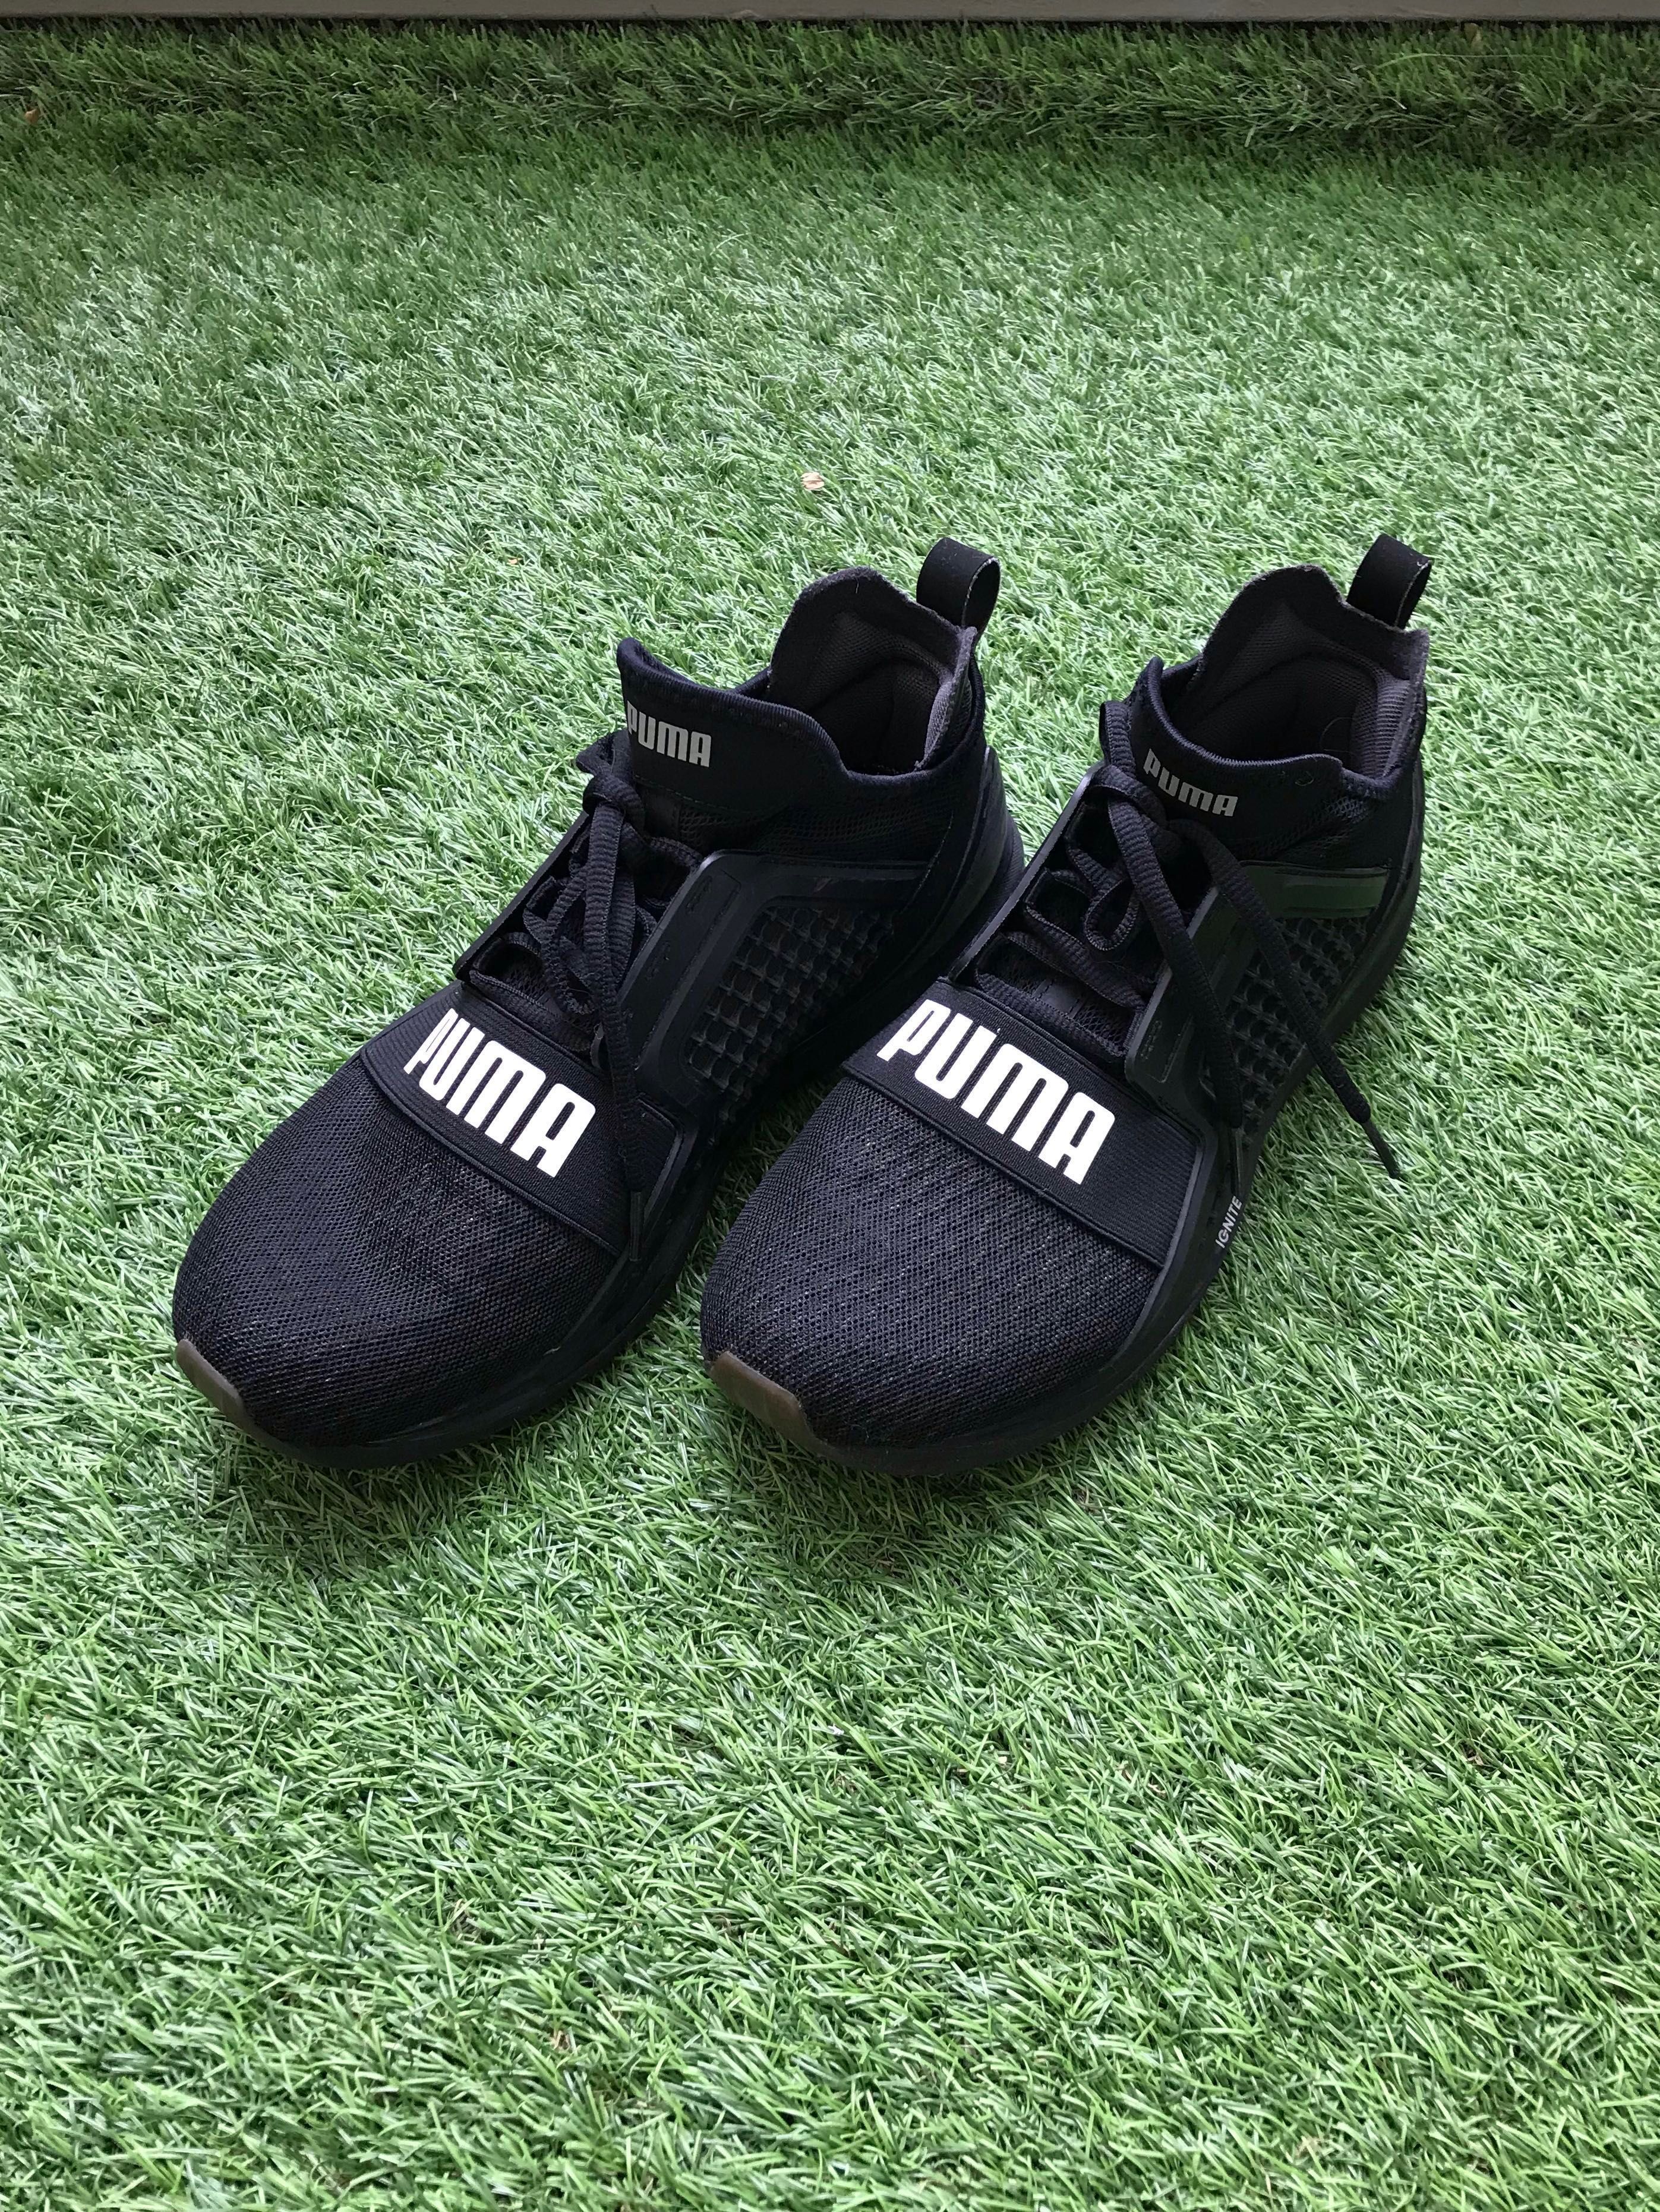 online retailer 6d1d9 71acc Puma Mens IGNITE Limitless Black